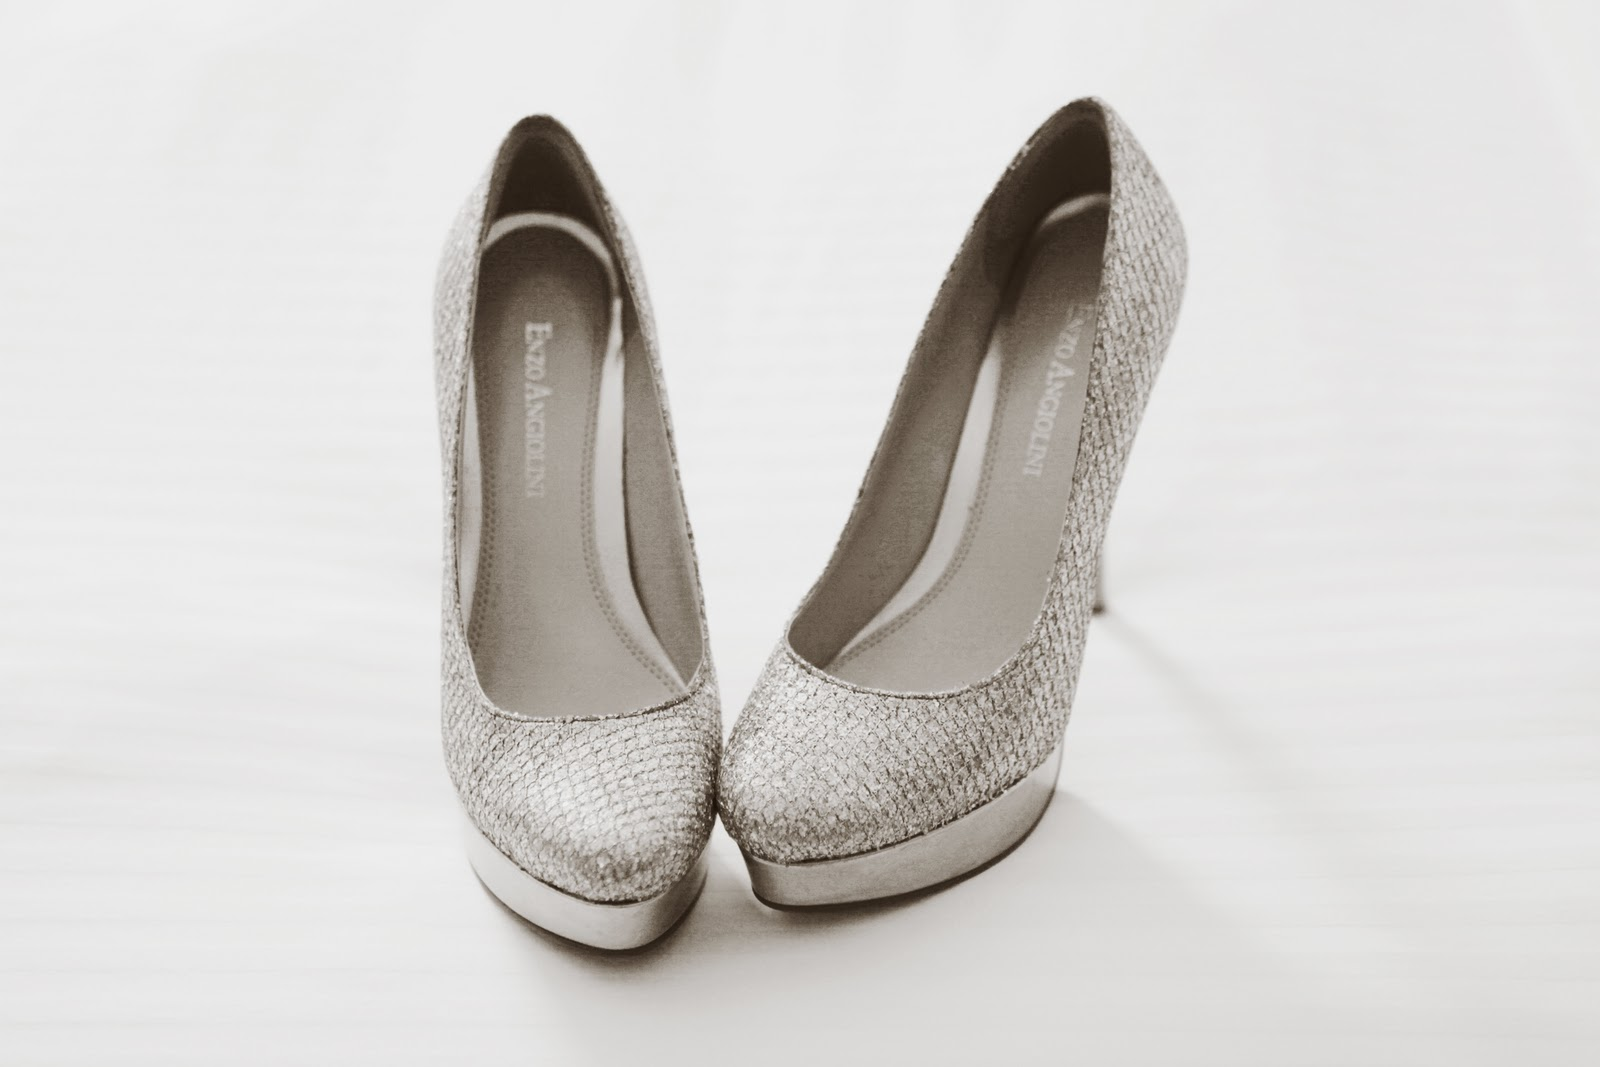 Bridal Shoes Low Heel 2015 Flats Wedges PIcs In Pakistan Mid Heel Low Heel Ivory Photos Bridal